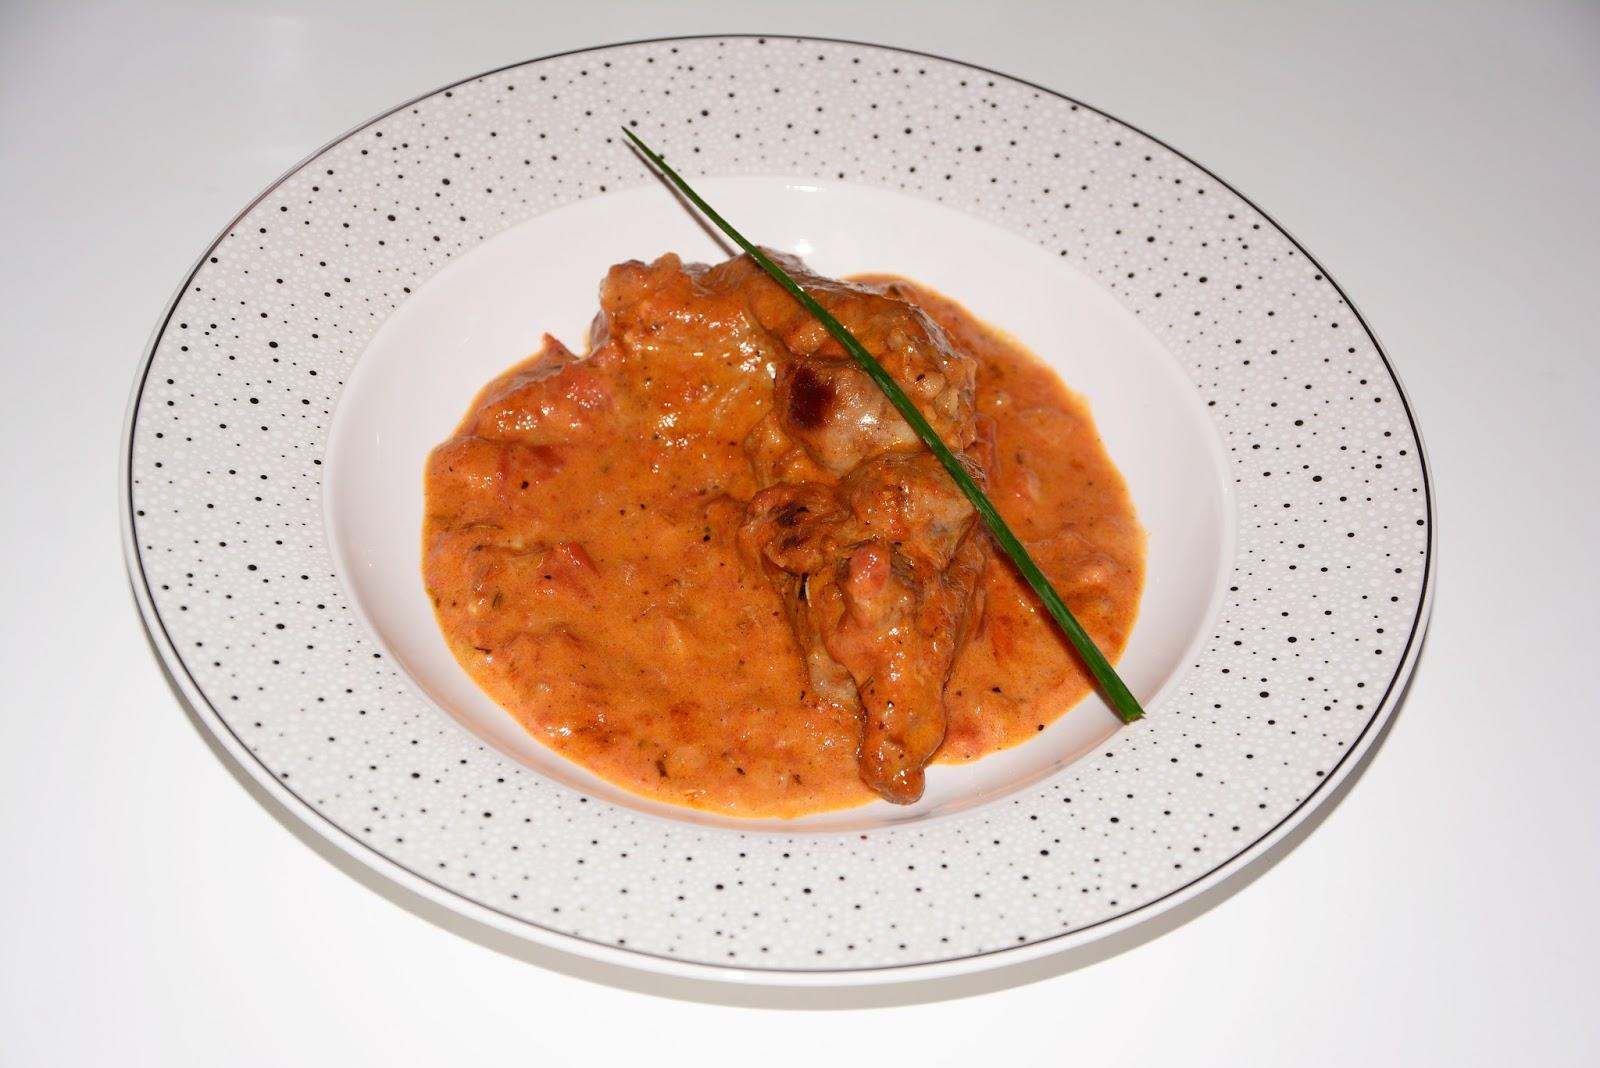 Lamb in creamy sauce